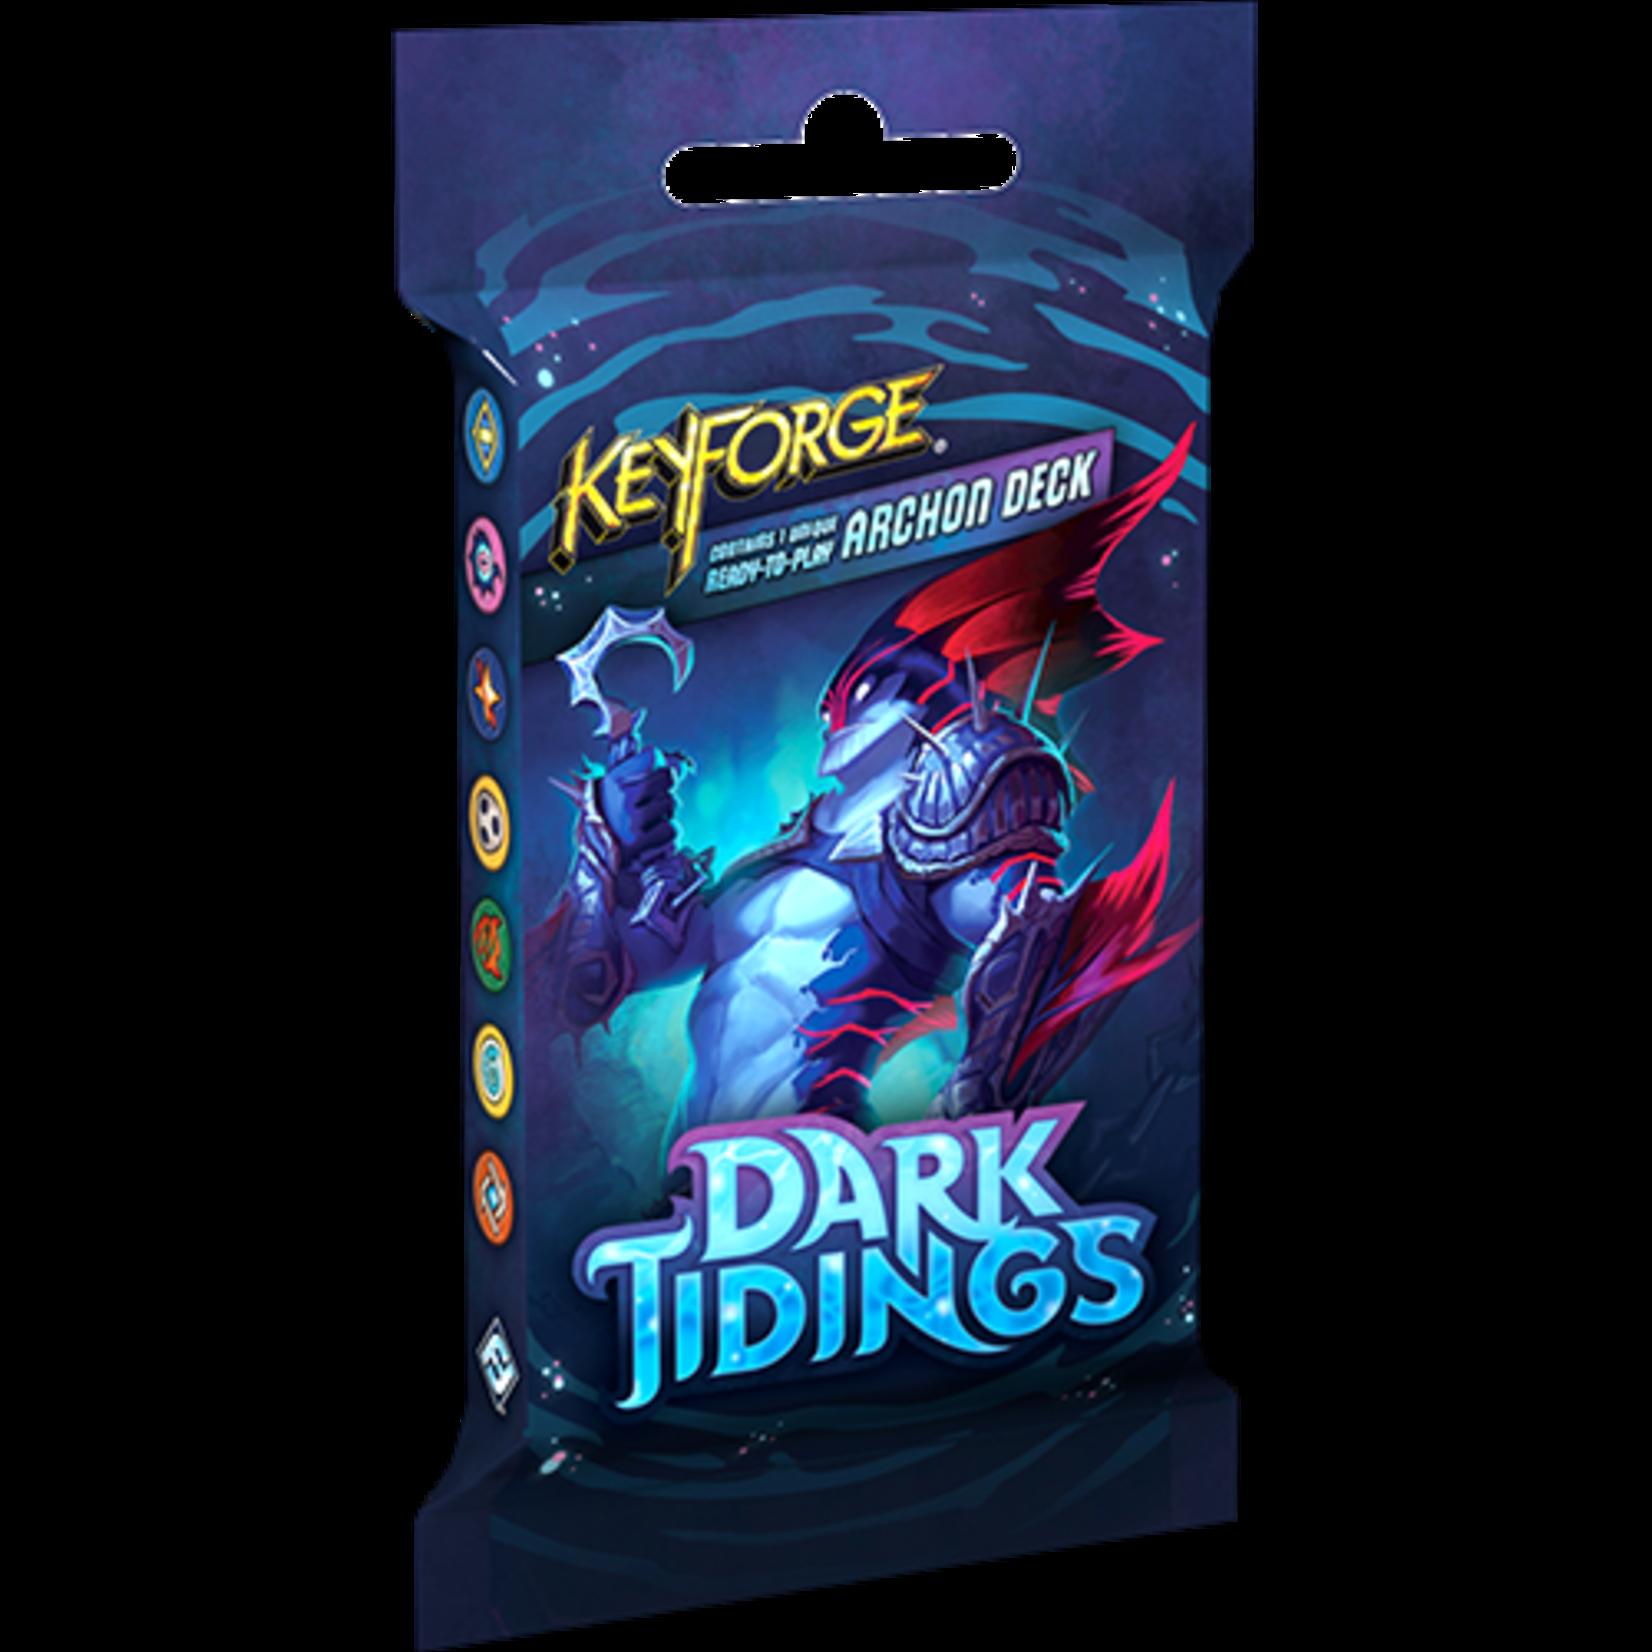 KeyForge Dark Tidings Archon Deck Display